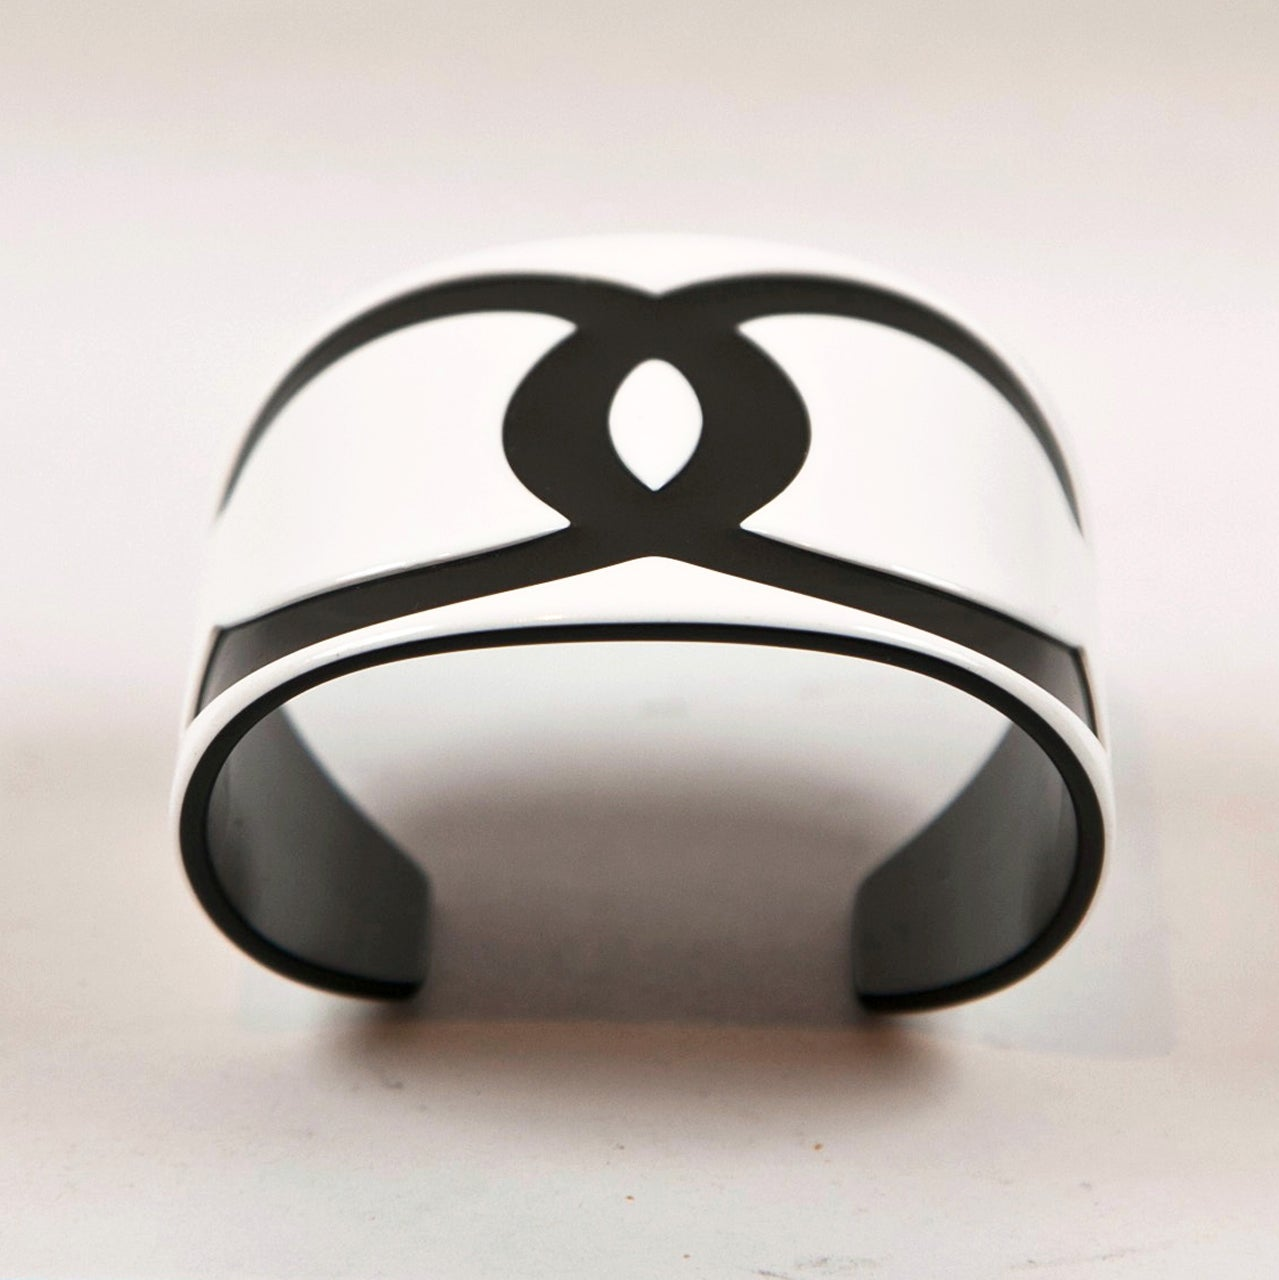 Chanel Resin Cuff image 4